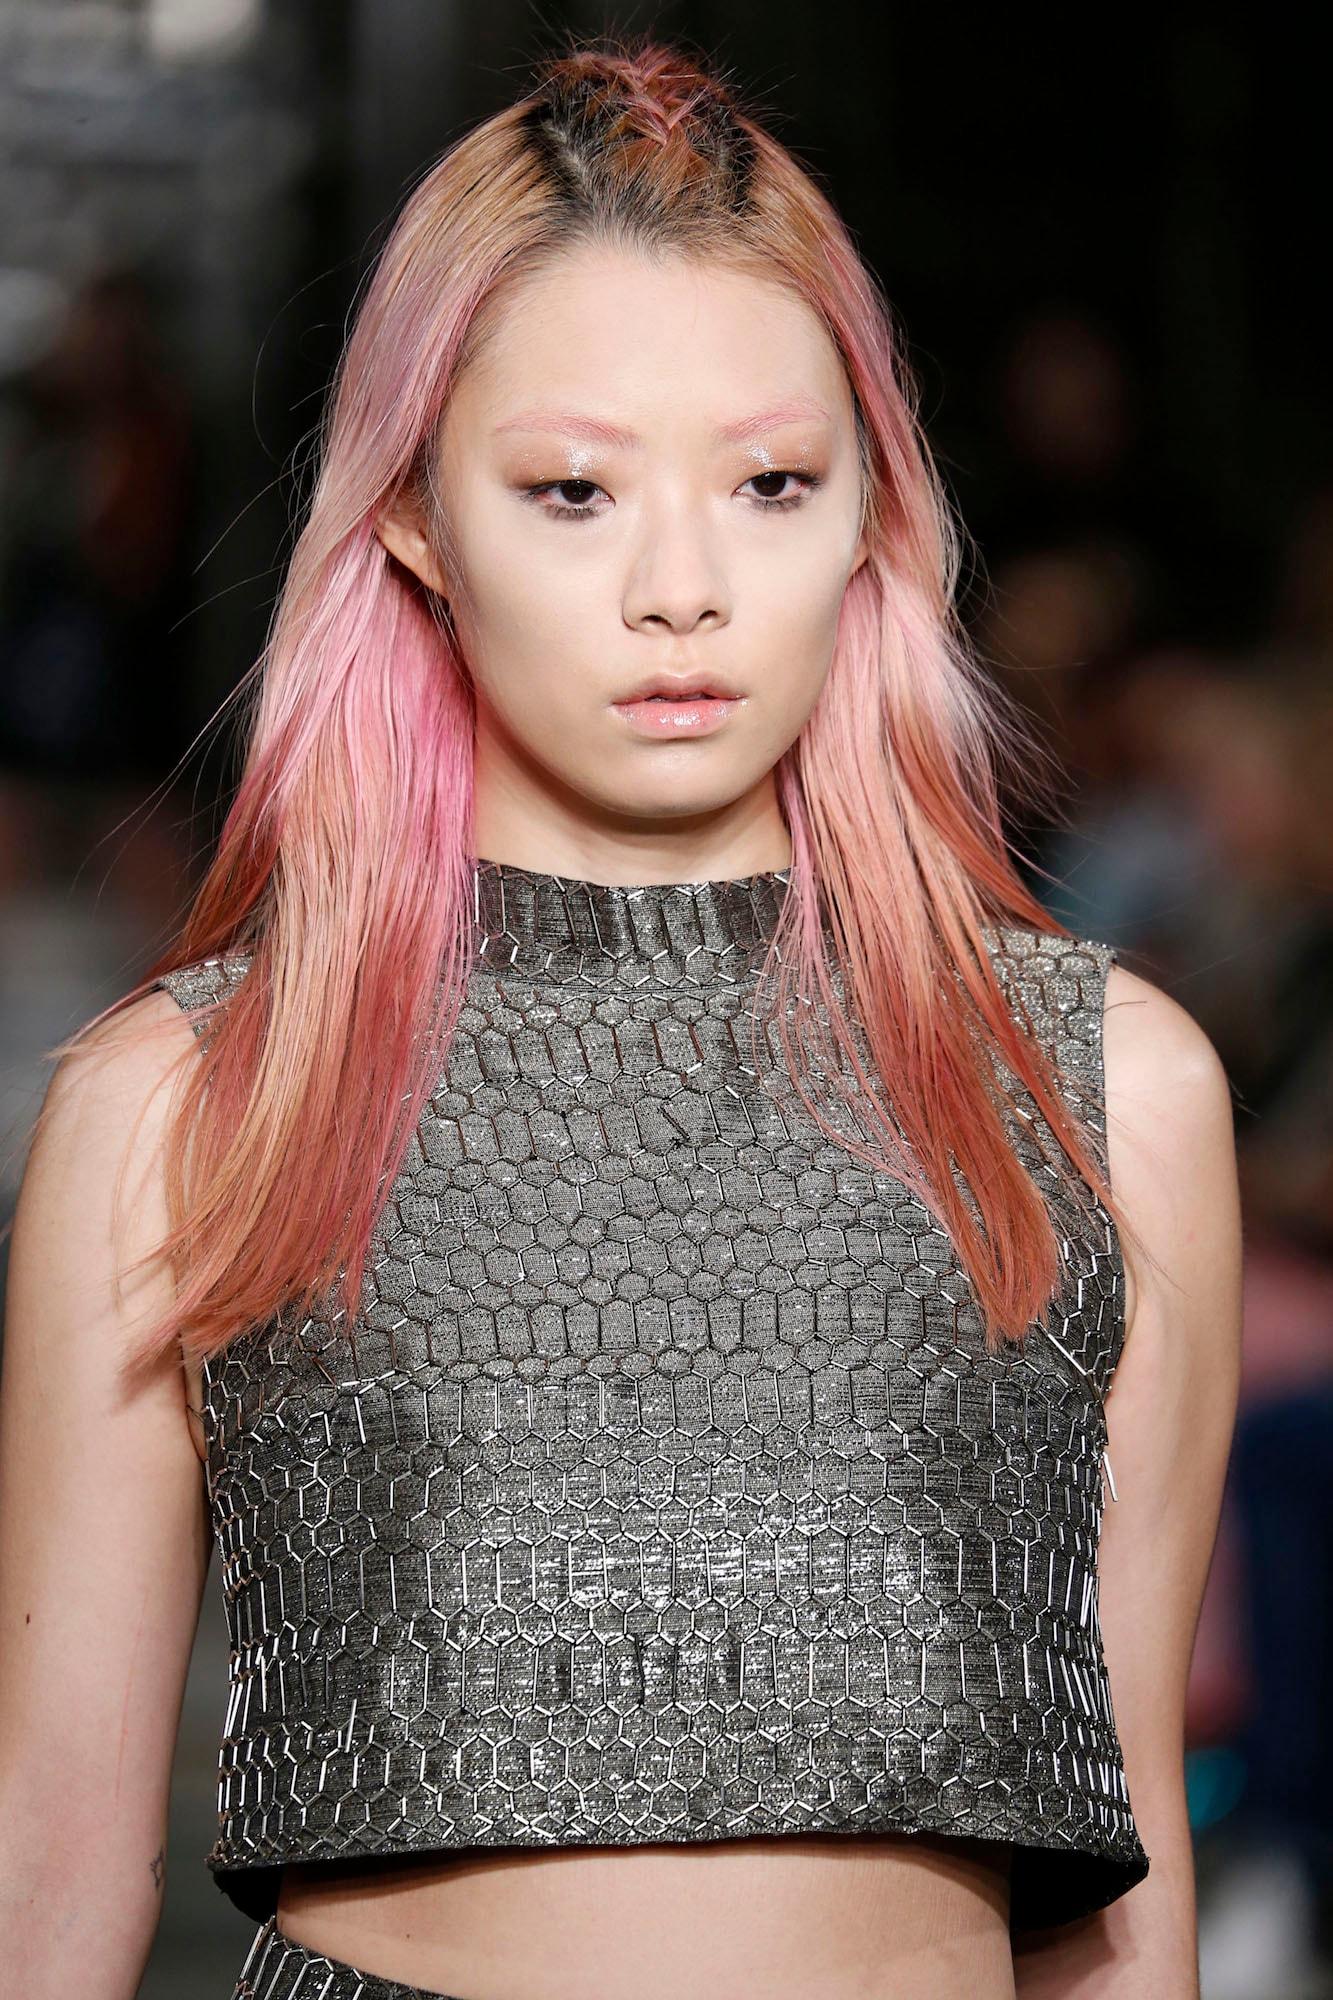 Warna rambut pink rose gold dengan highlight warna emas.